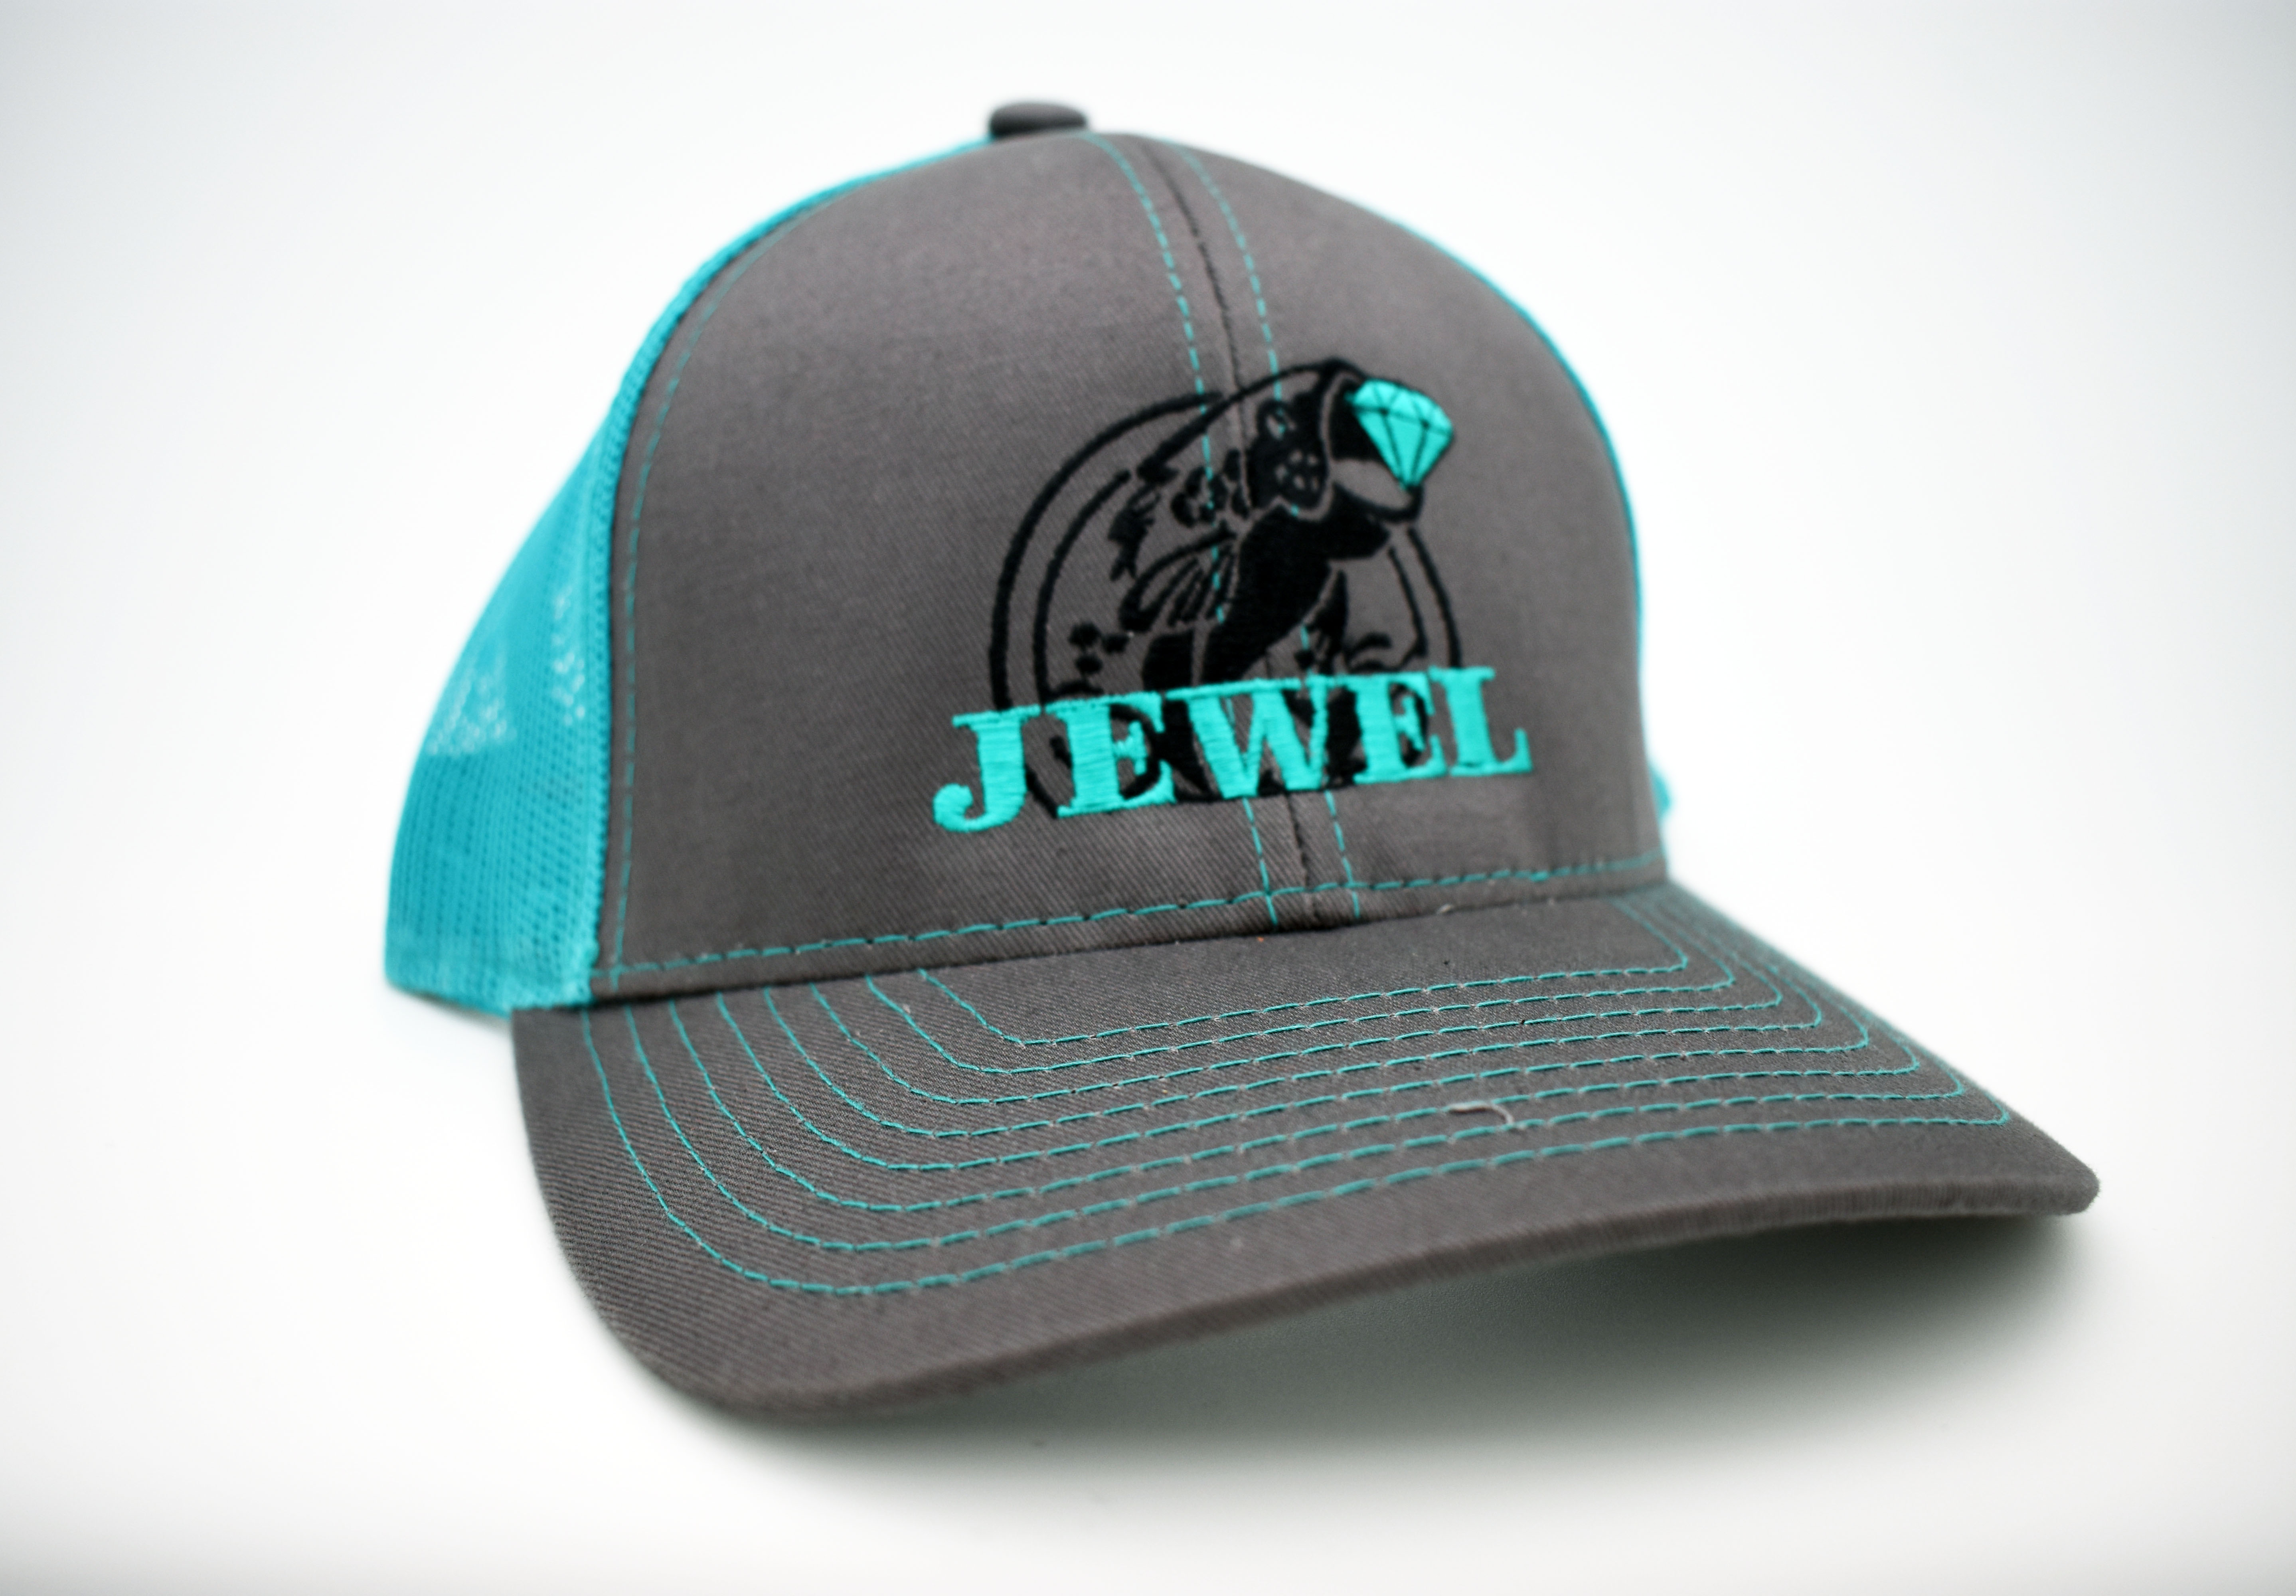 NEW Jewel Cap